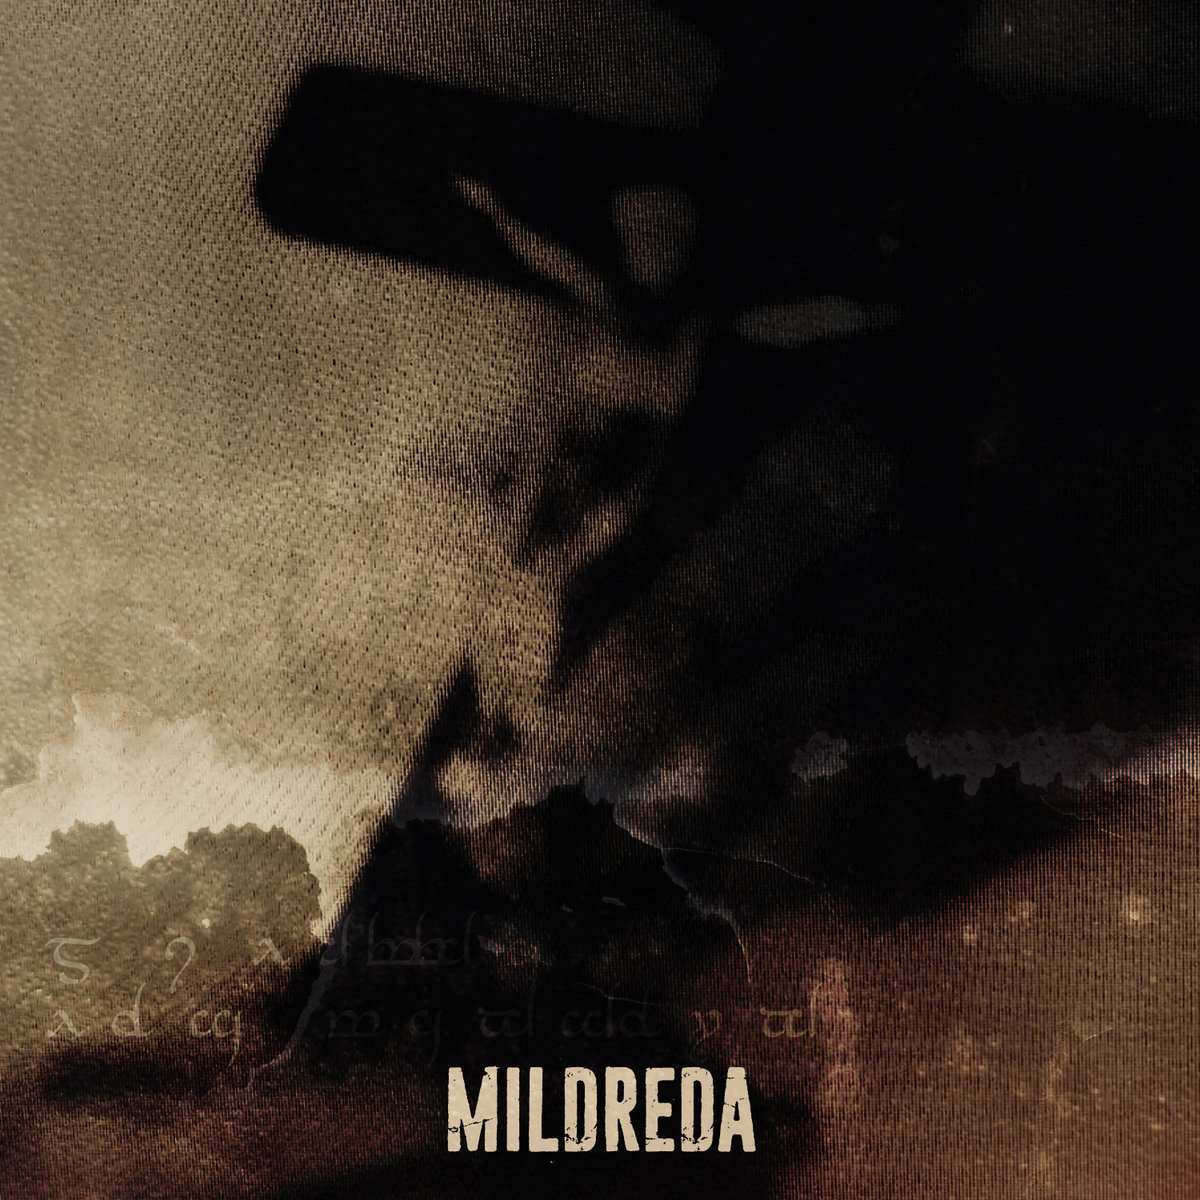 Coward philosophy bonus tracks version alfa matrix by mildreda malvernweather Image collections